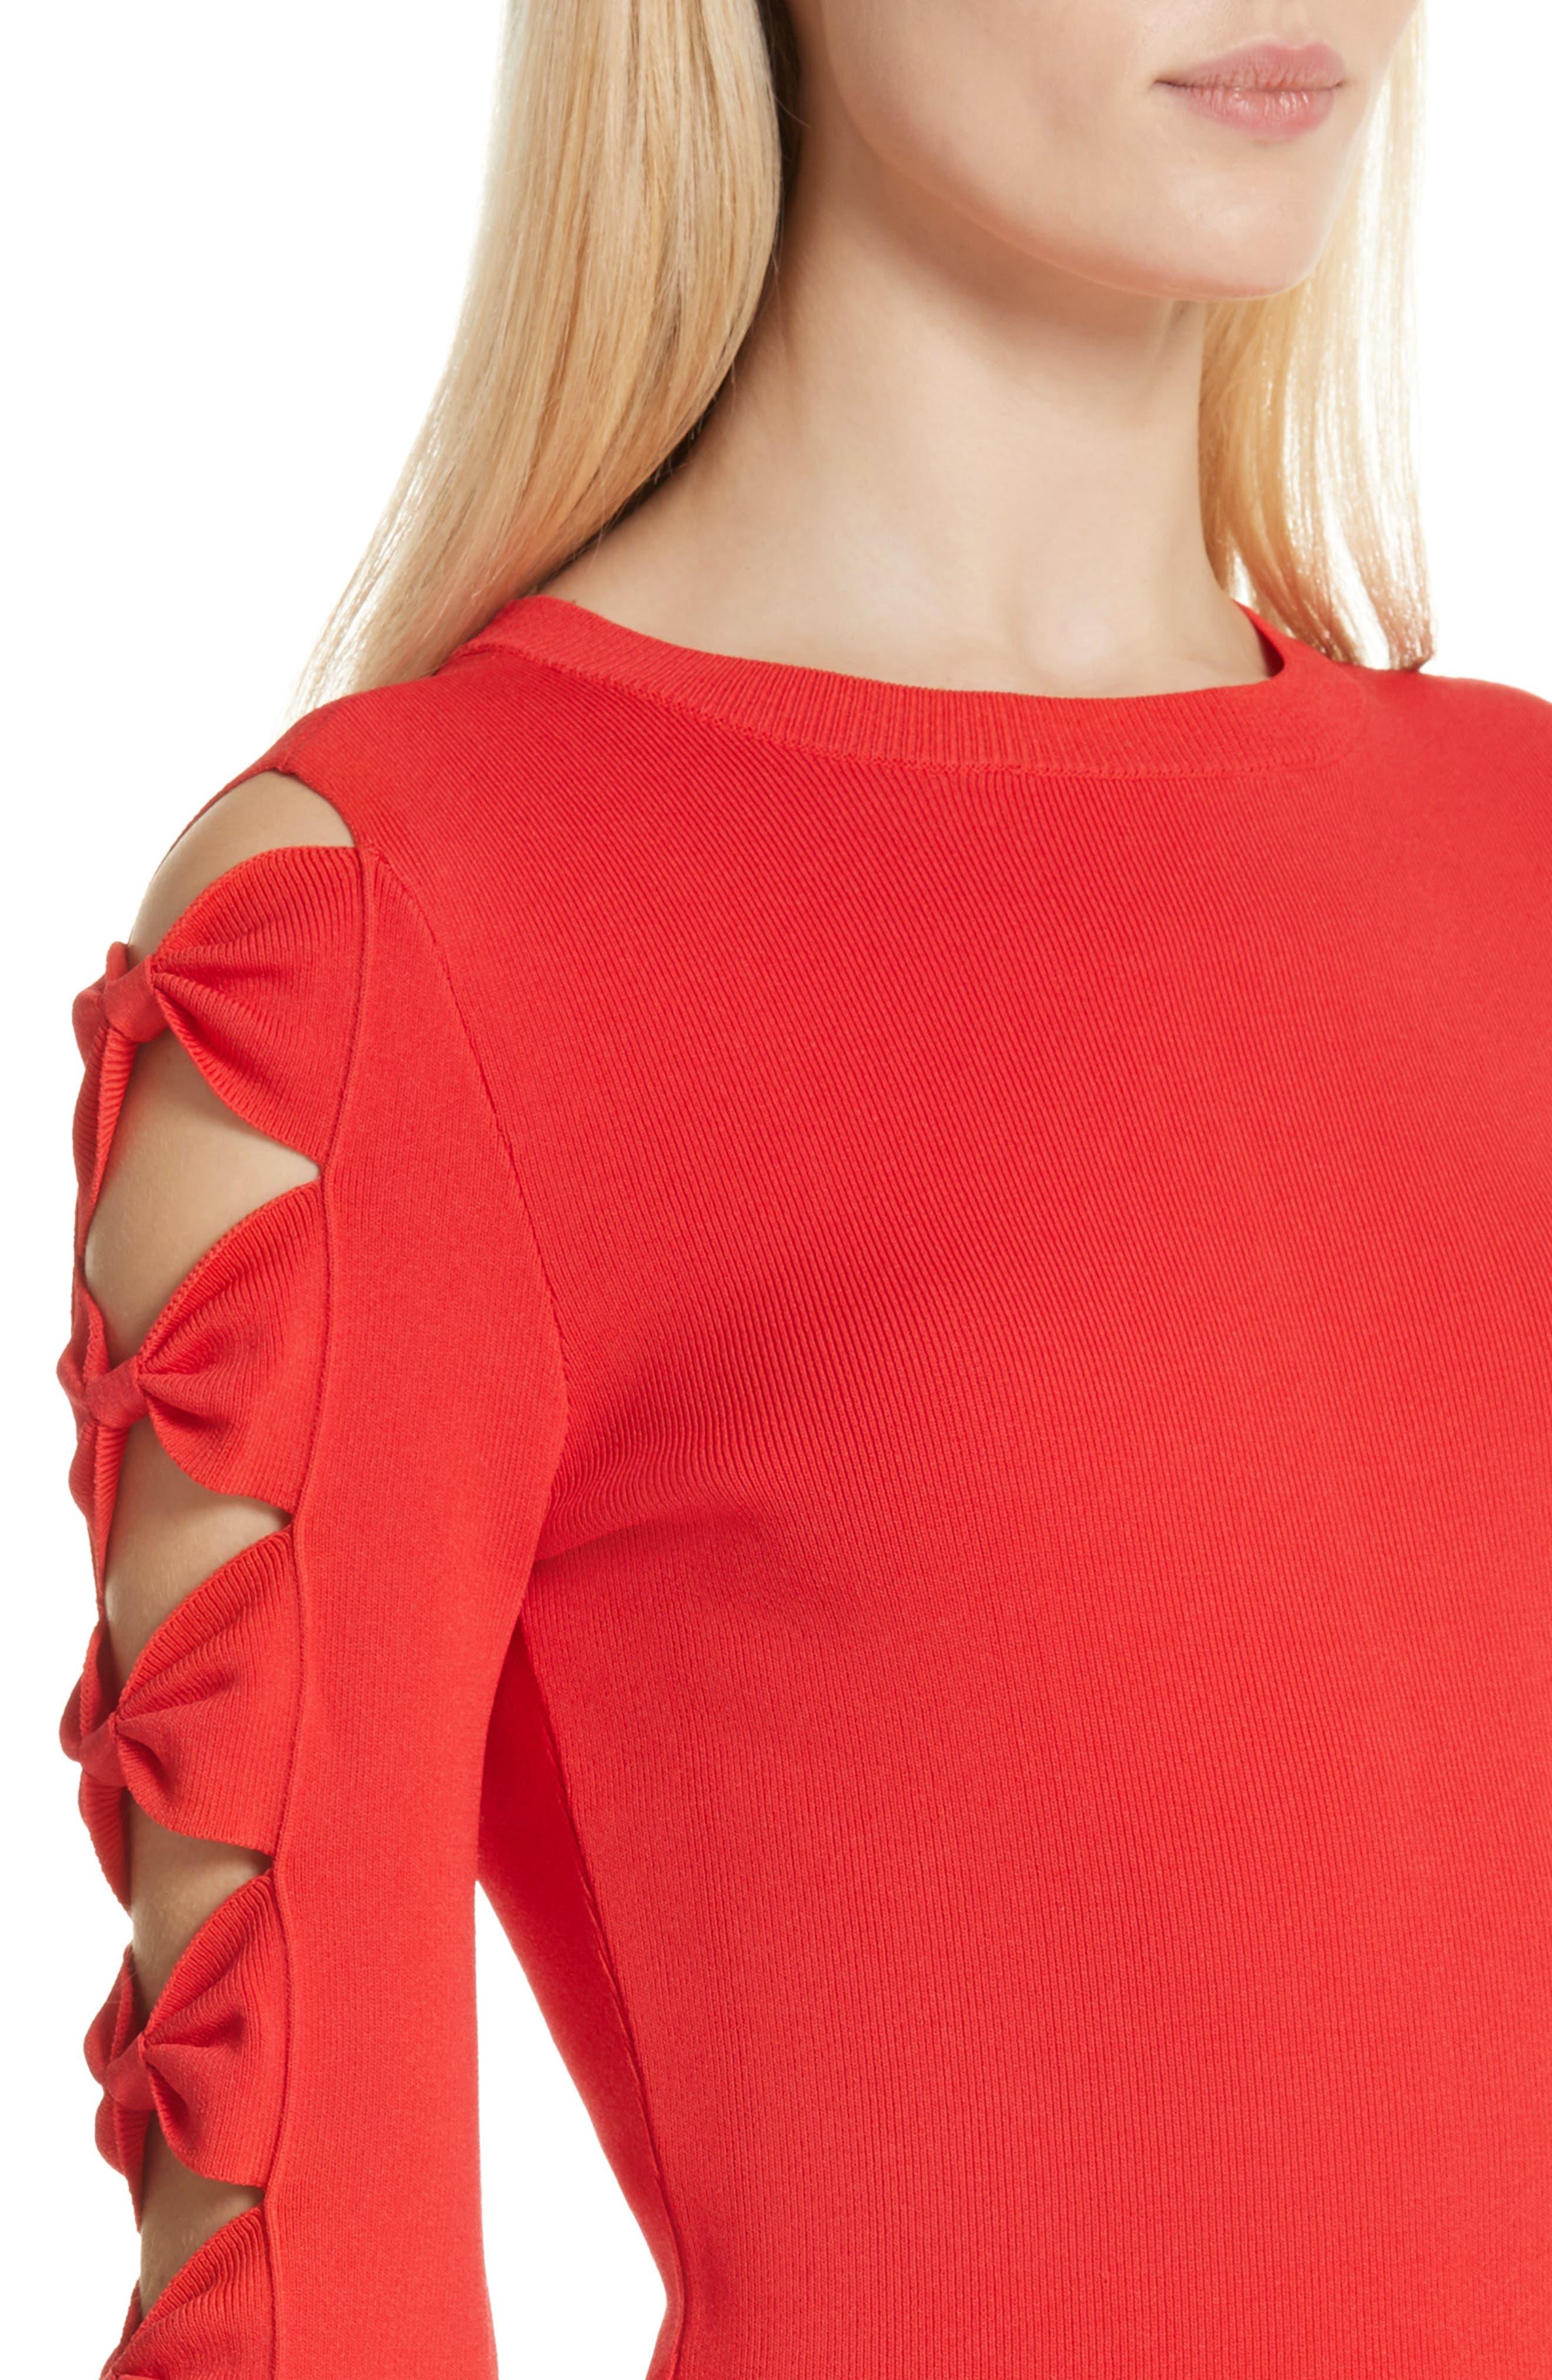 Yonoh Cutout Sleeve Sweater,                             Alternate thumbnail 4, color,                             600